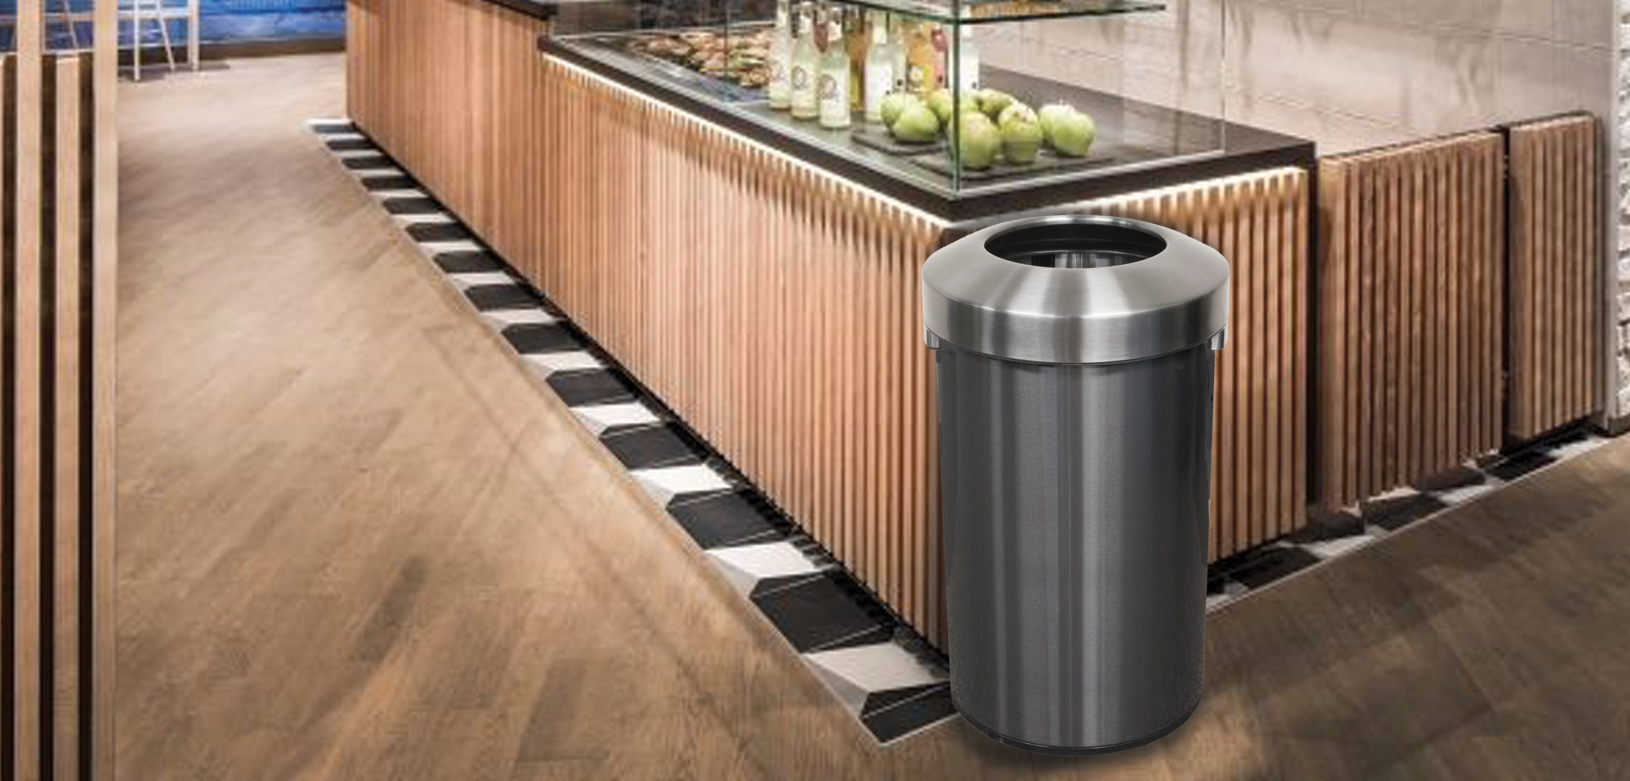 Witt Aluminum Monarch Series Galvanize Trash Can Indoor Environmental